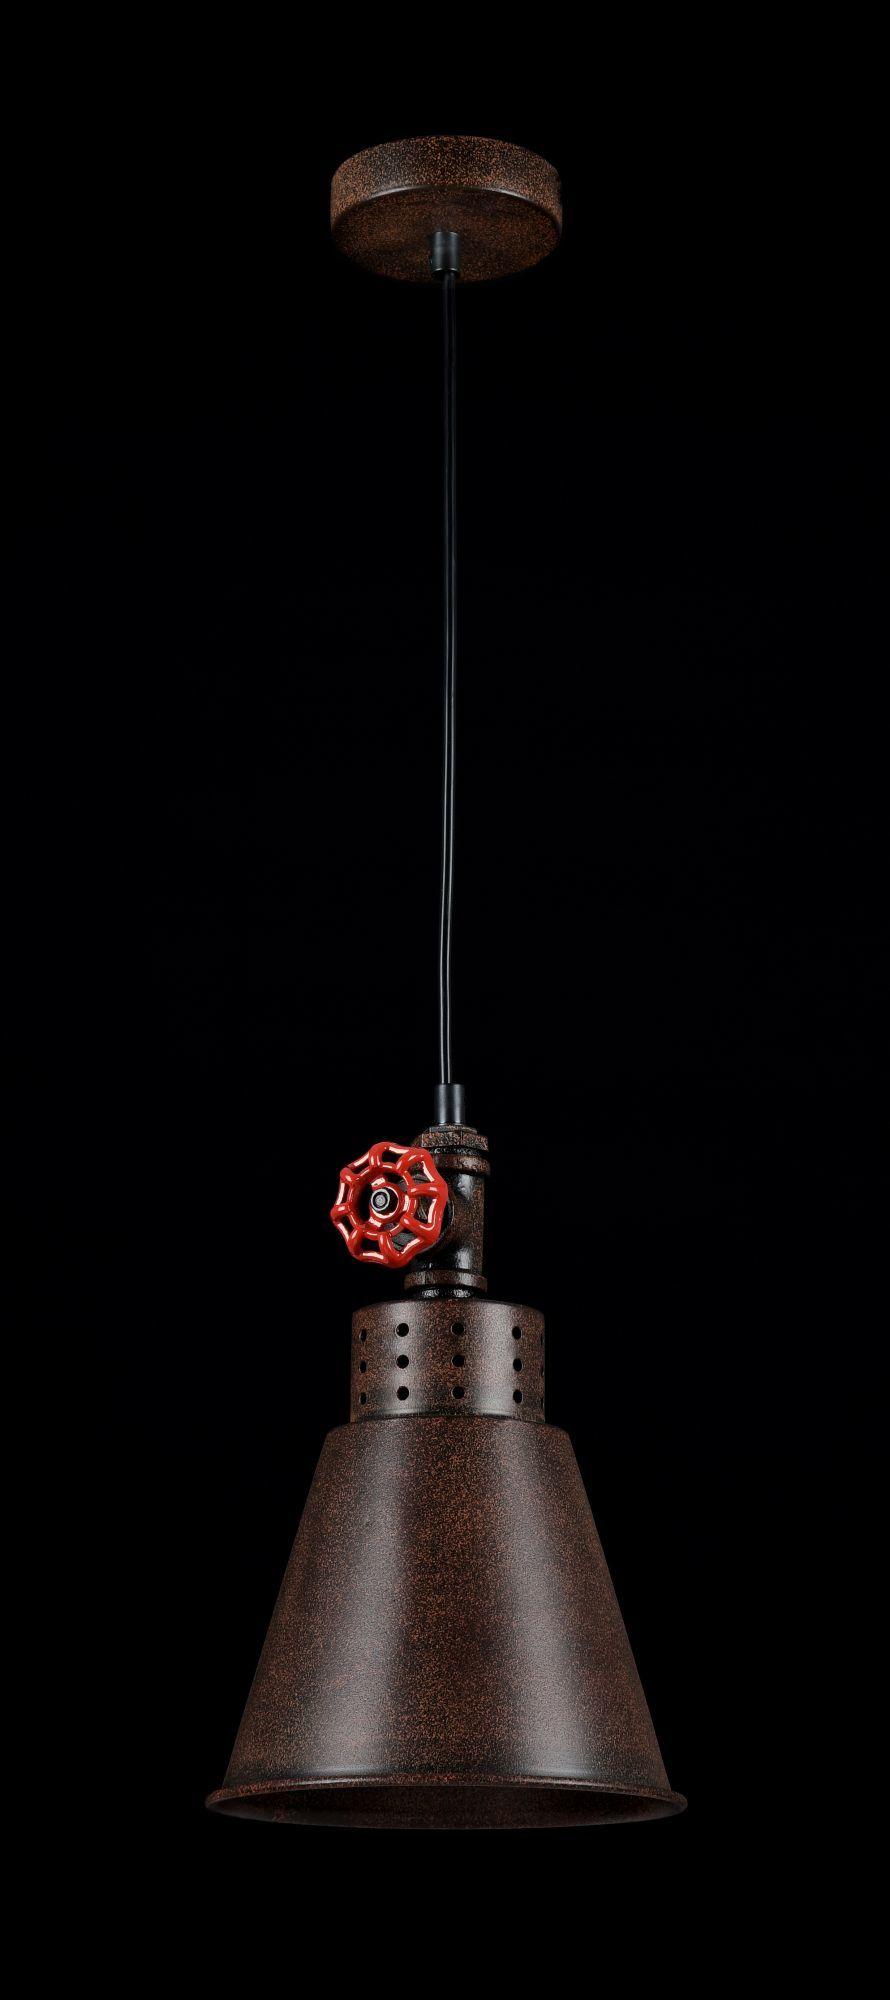 Подвесной светильник Maytoni Valve T020-01-R, 1xE27x60W, коричневый, металл - фото 2